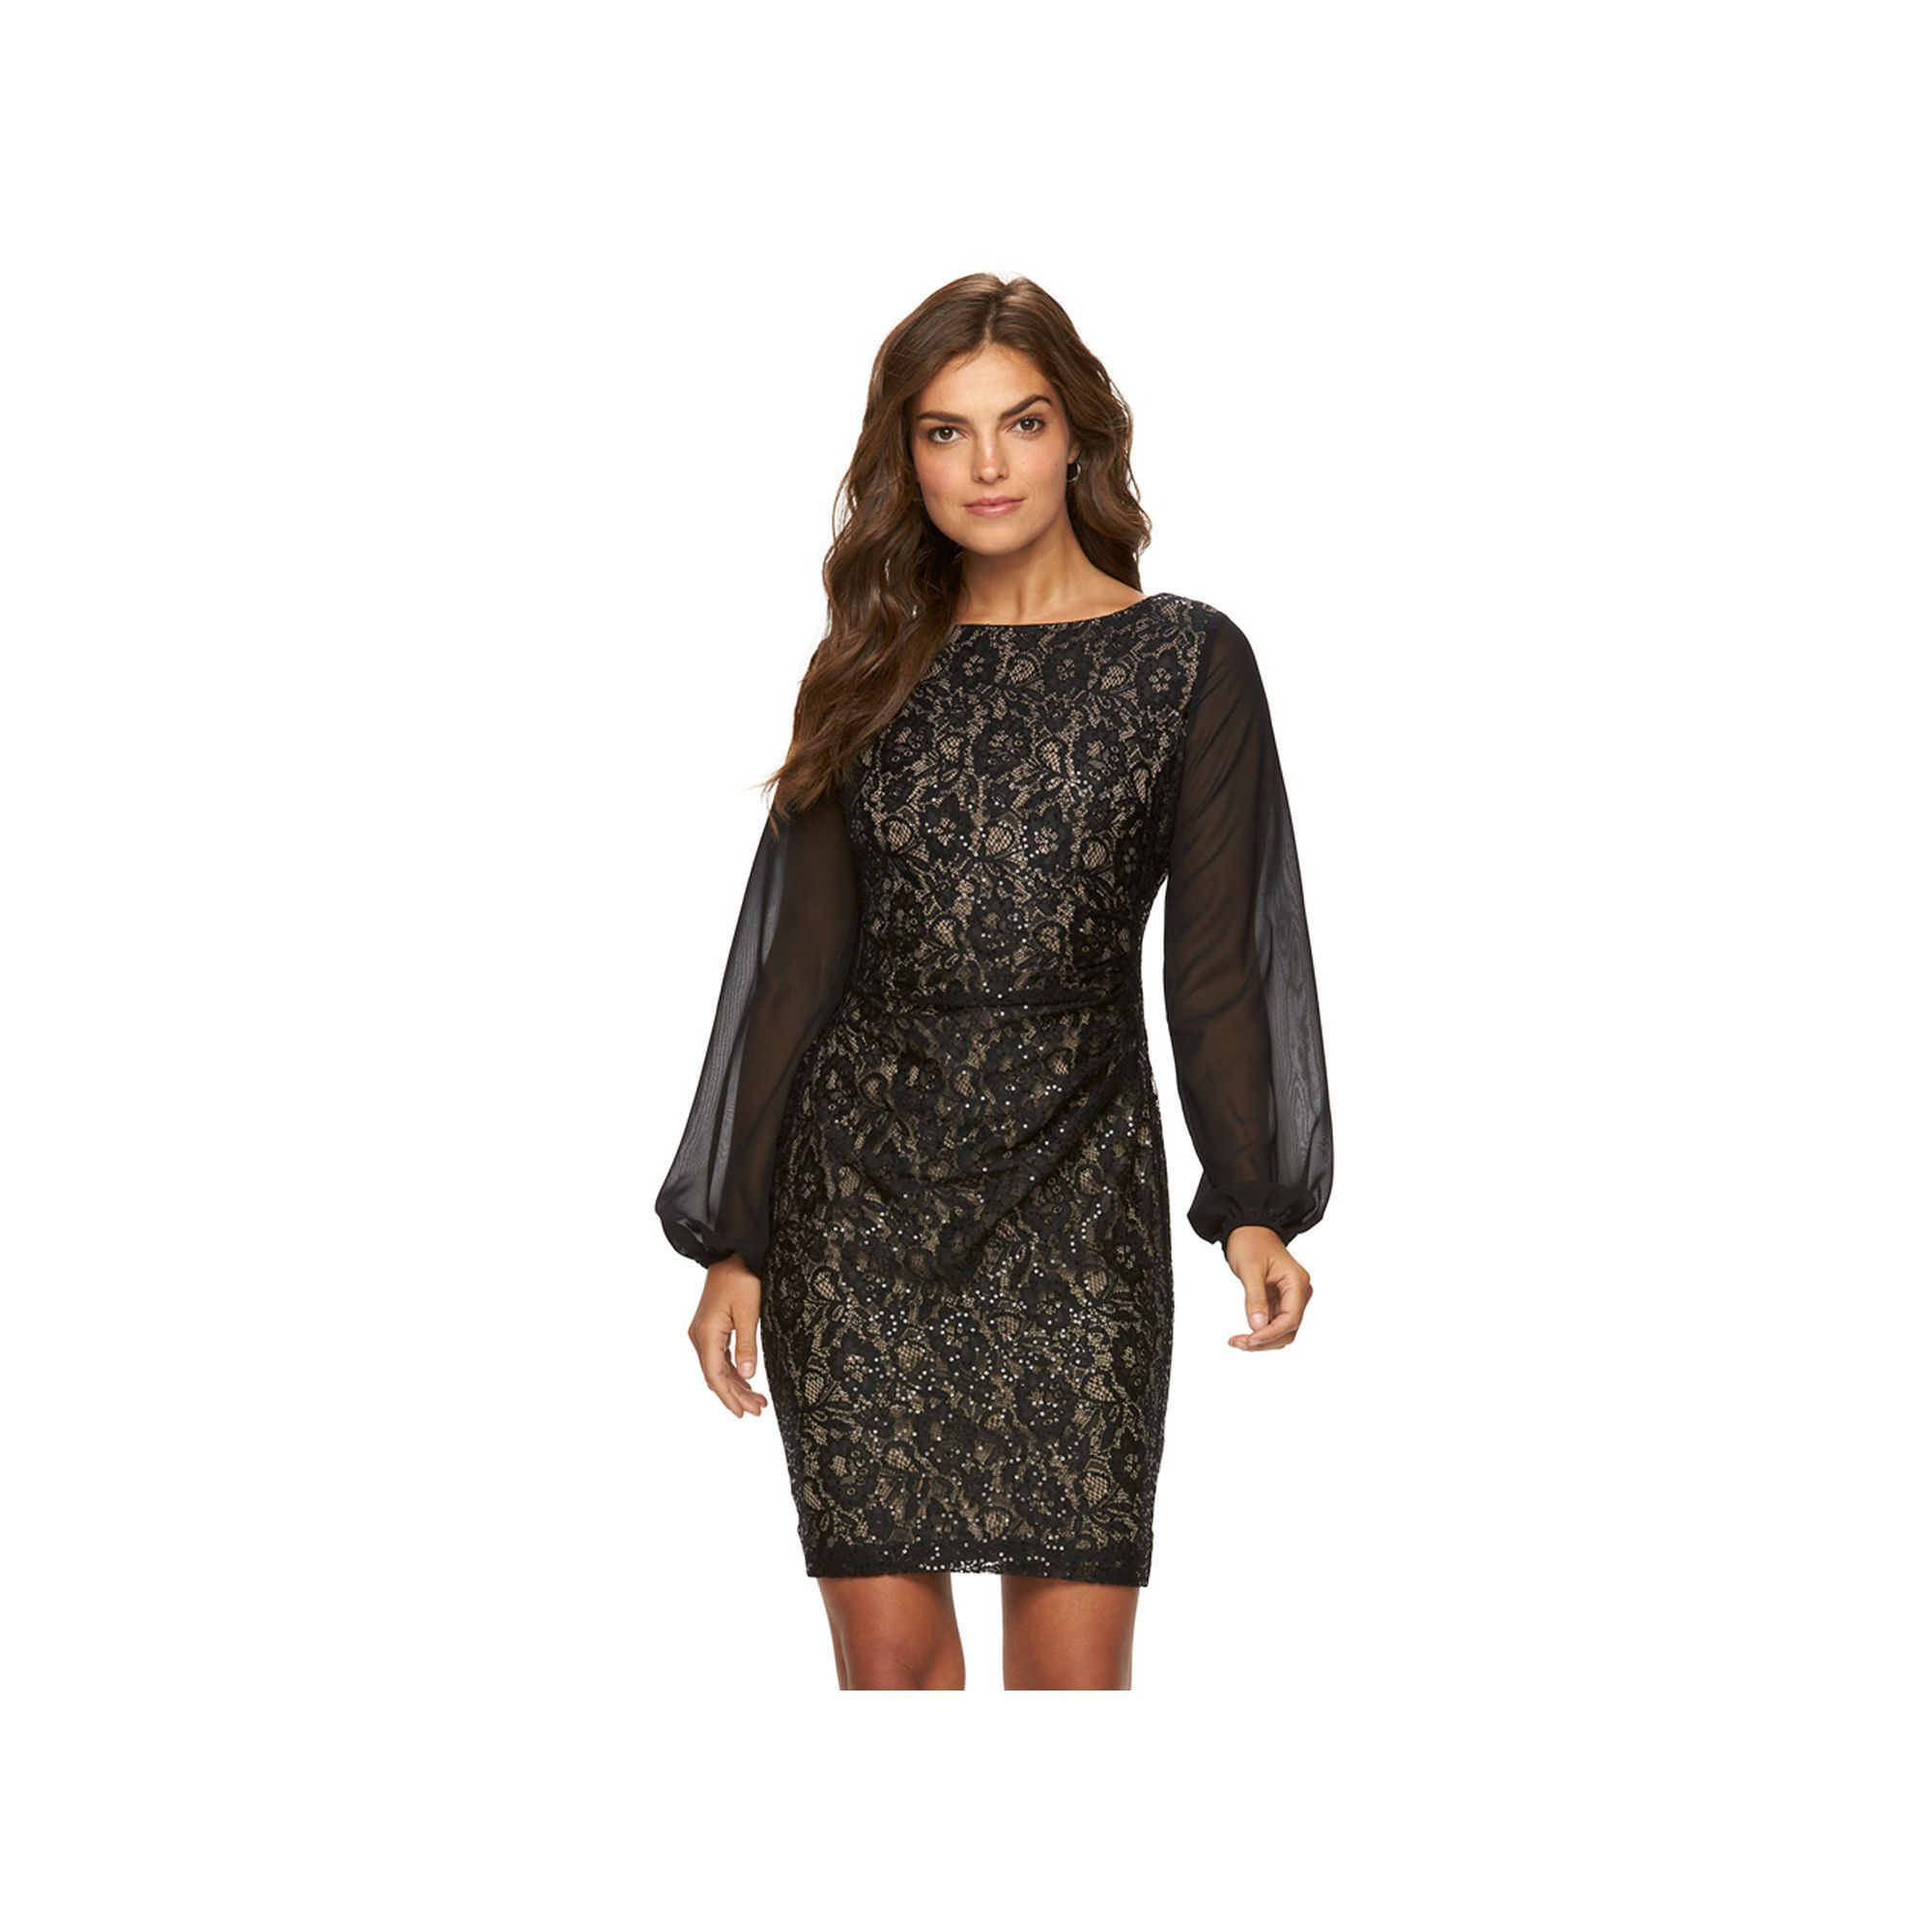 Women's Chaps Lace Sequin Sheath Evening Dress, Size: 2, Blue (Navy)